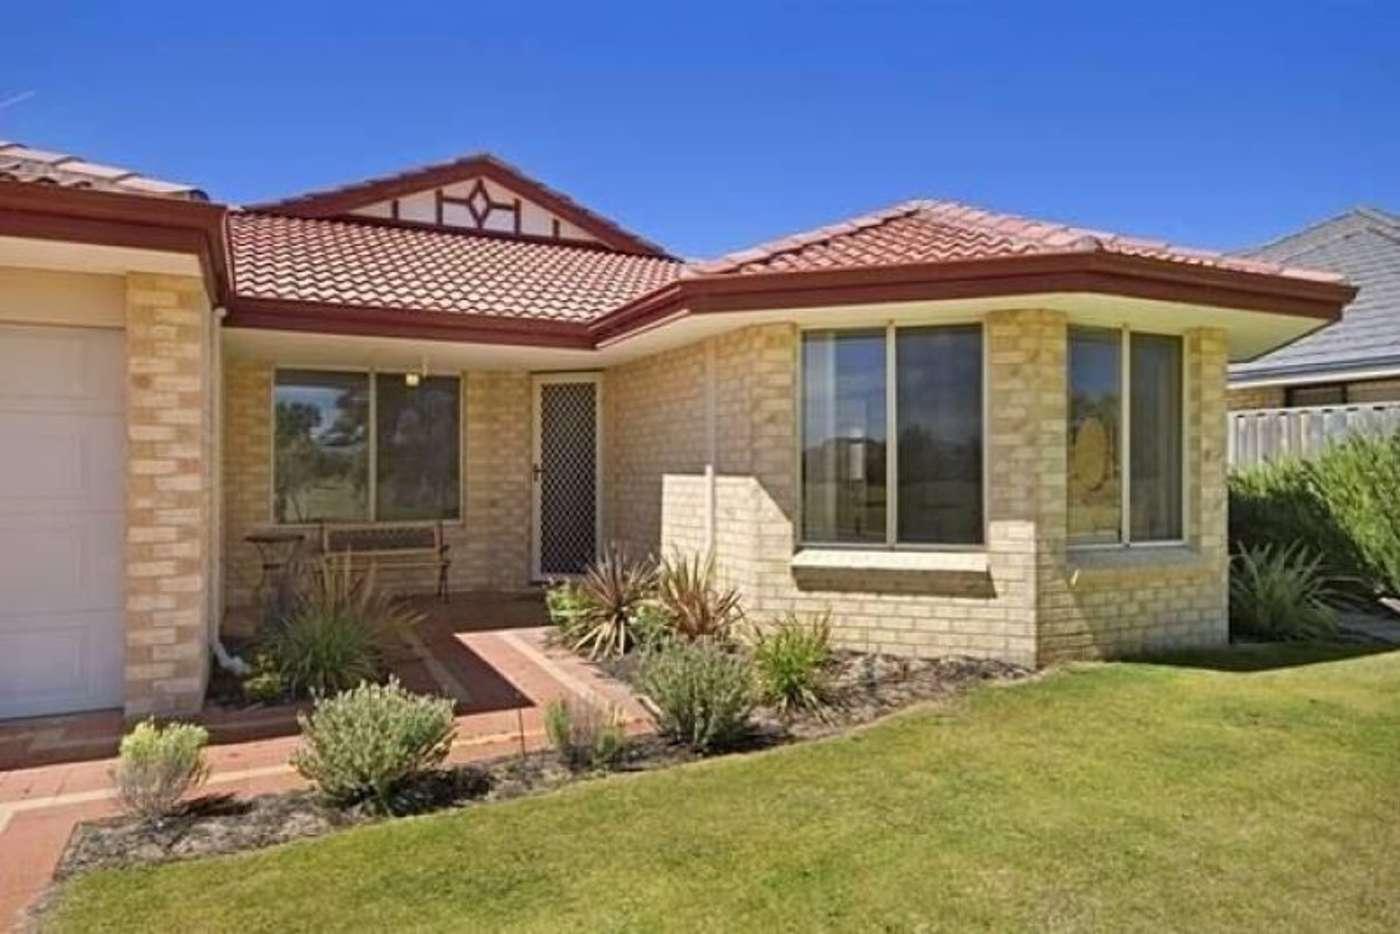 Main view of Homely house listing, 10 Properjohn Drive, Rockingham WA 6168